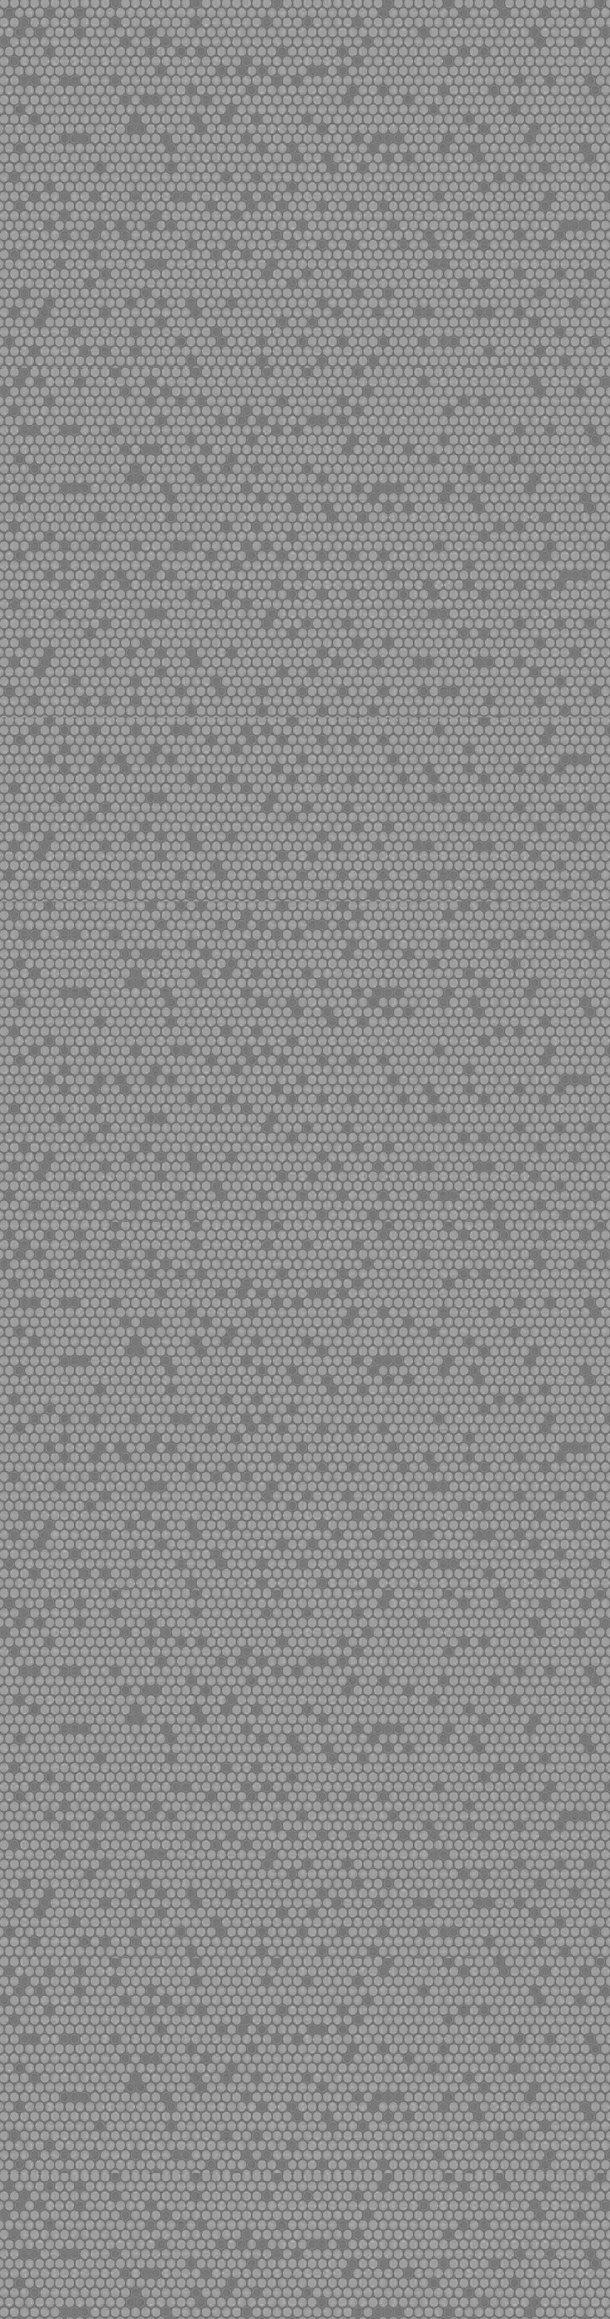 simplifiArtbackgris333.jpg